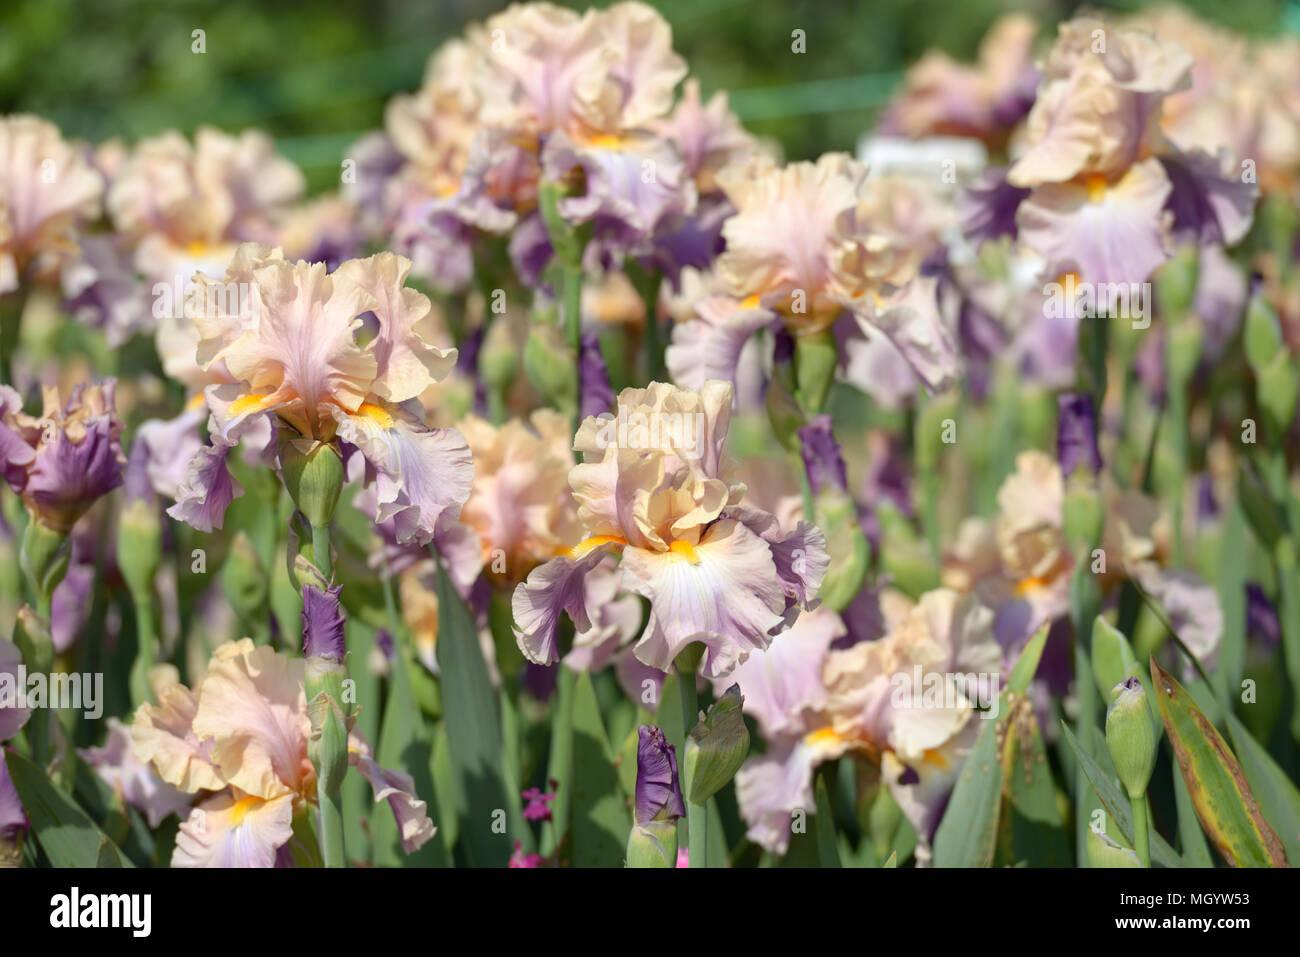 Flowers of bearded iris on a flower bed stock photo 182550623 alamy flowers of bearded iris on a flower bed izmirmasajfo